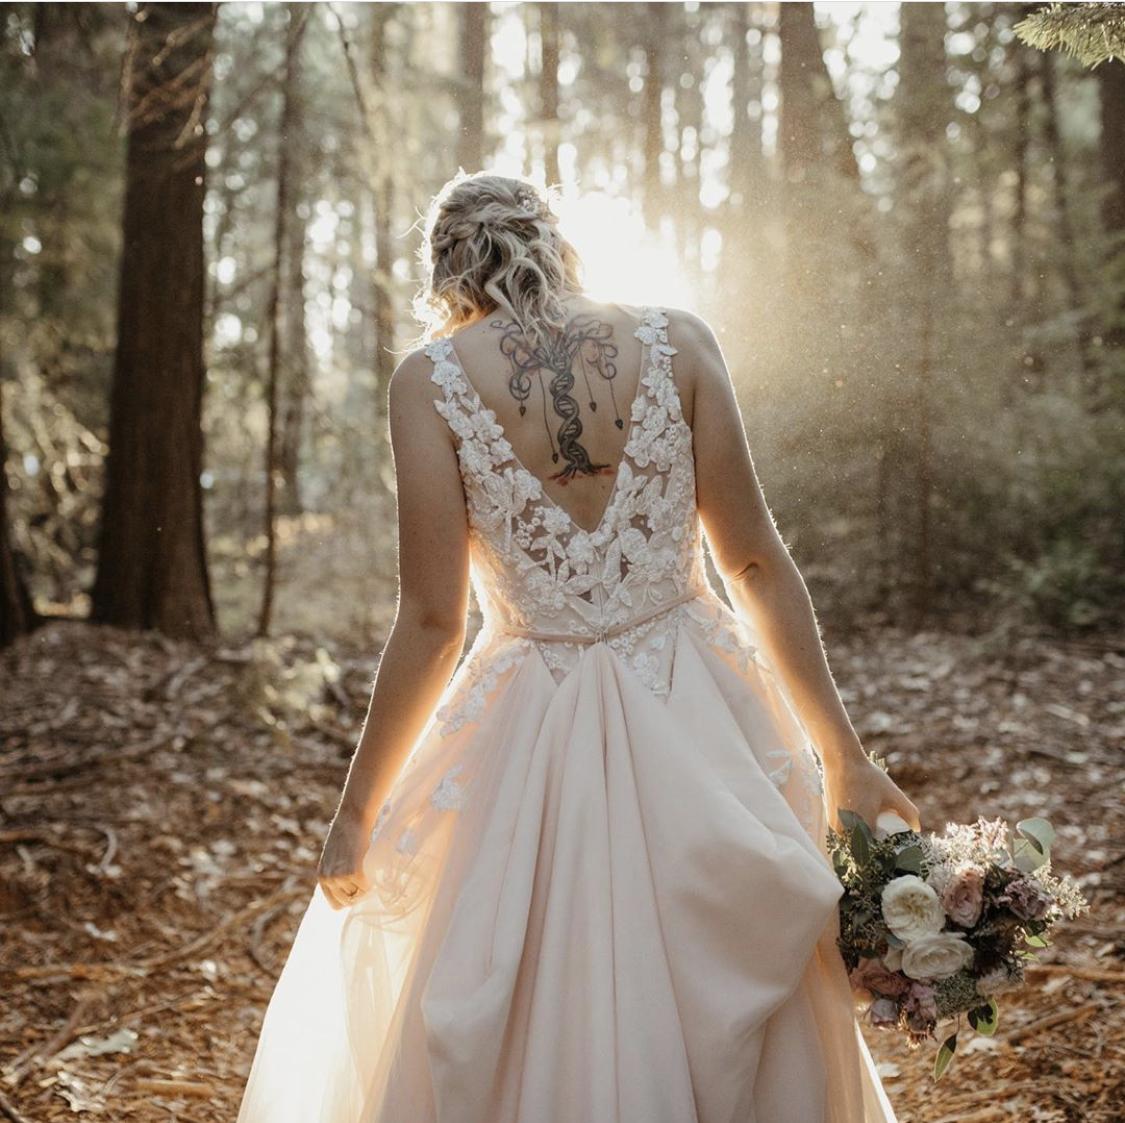 Wedding dress customizer Anomalie raises $9M as bridal stores